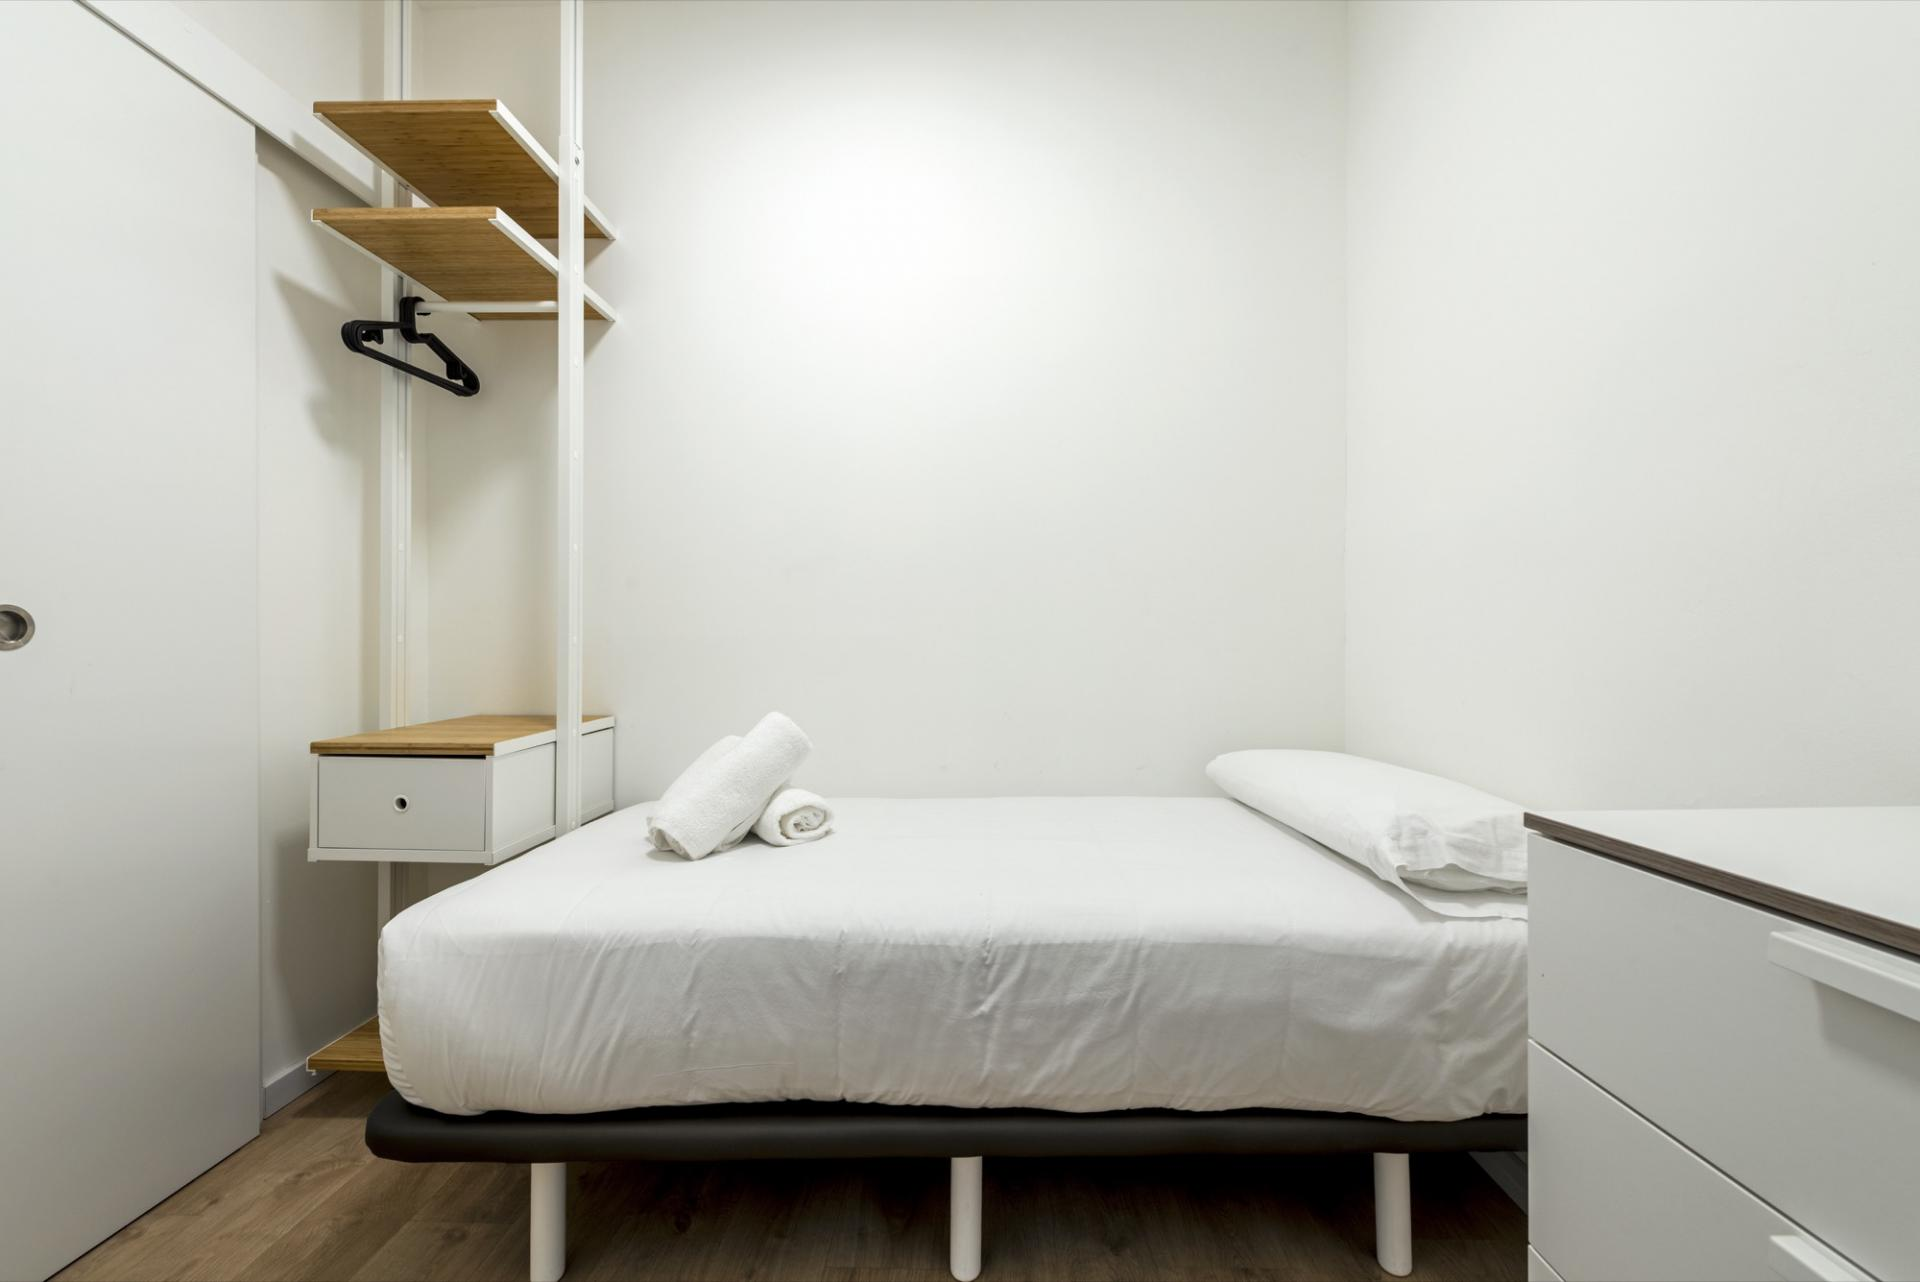 Towels at Pelayo Suites, El Raval, Barcelona - Citybase Apartments